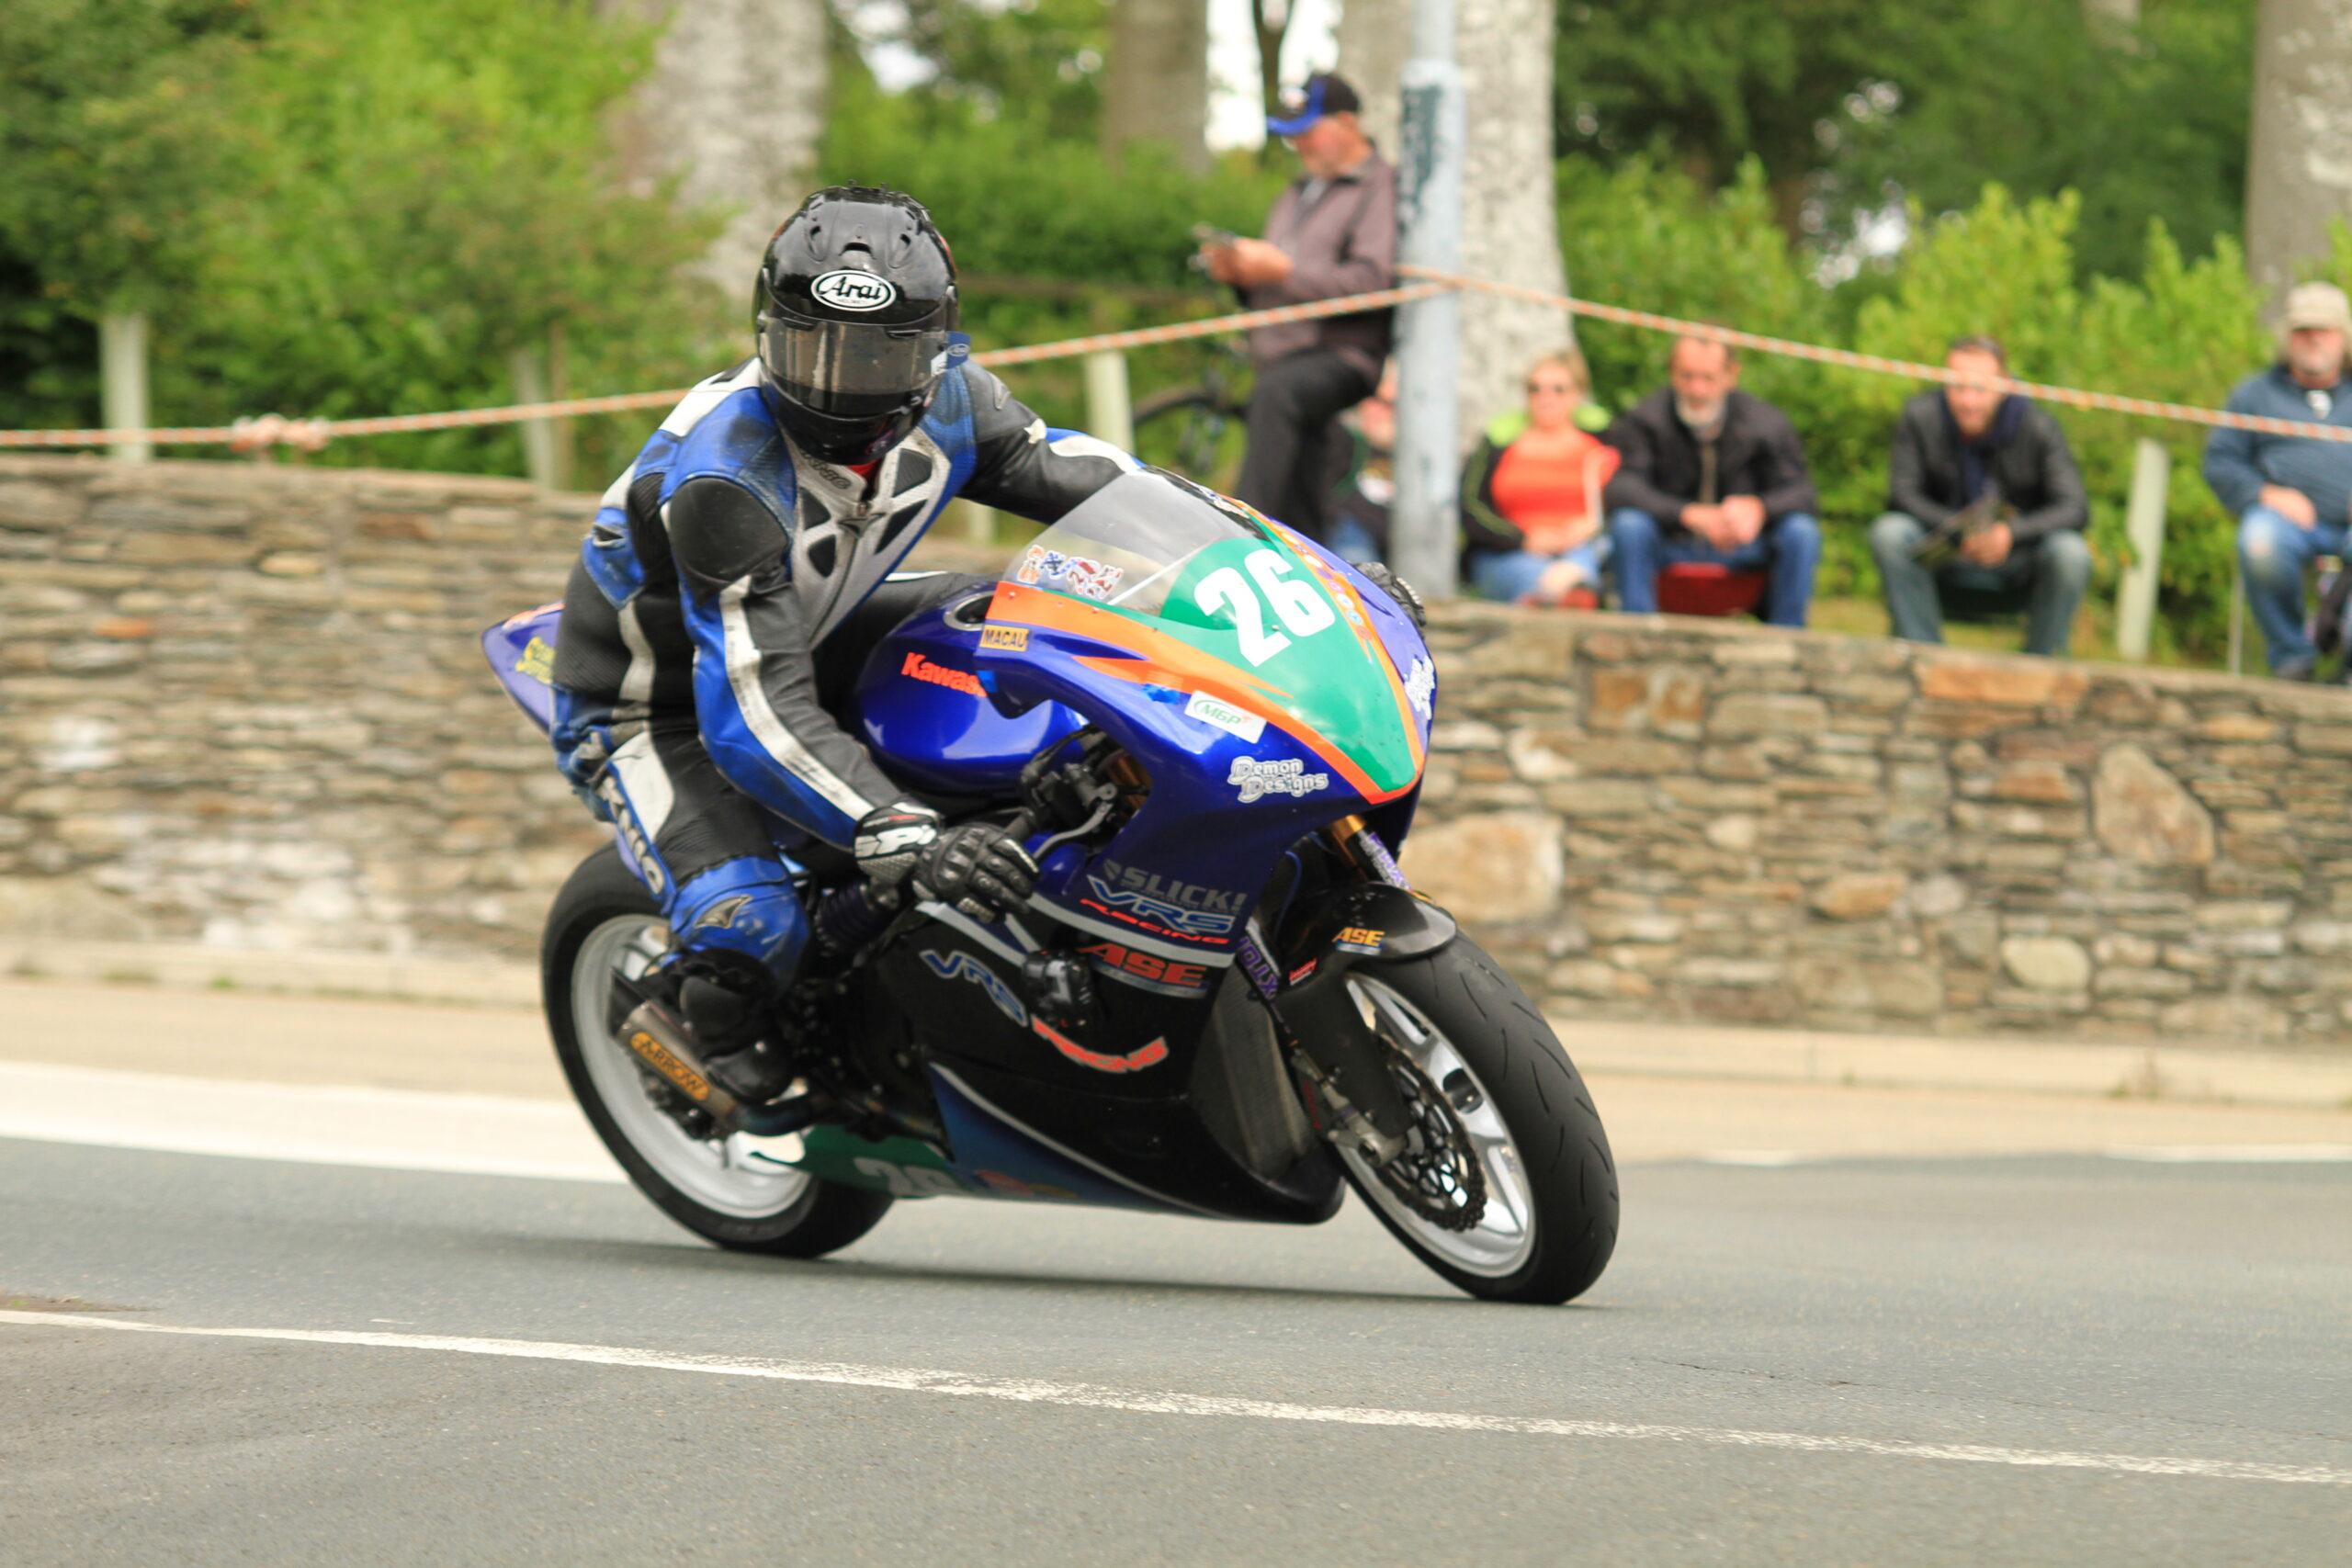 Pete Murray Enjoys Solid Manx With VRS Racing